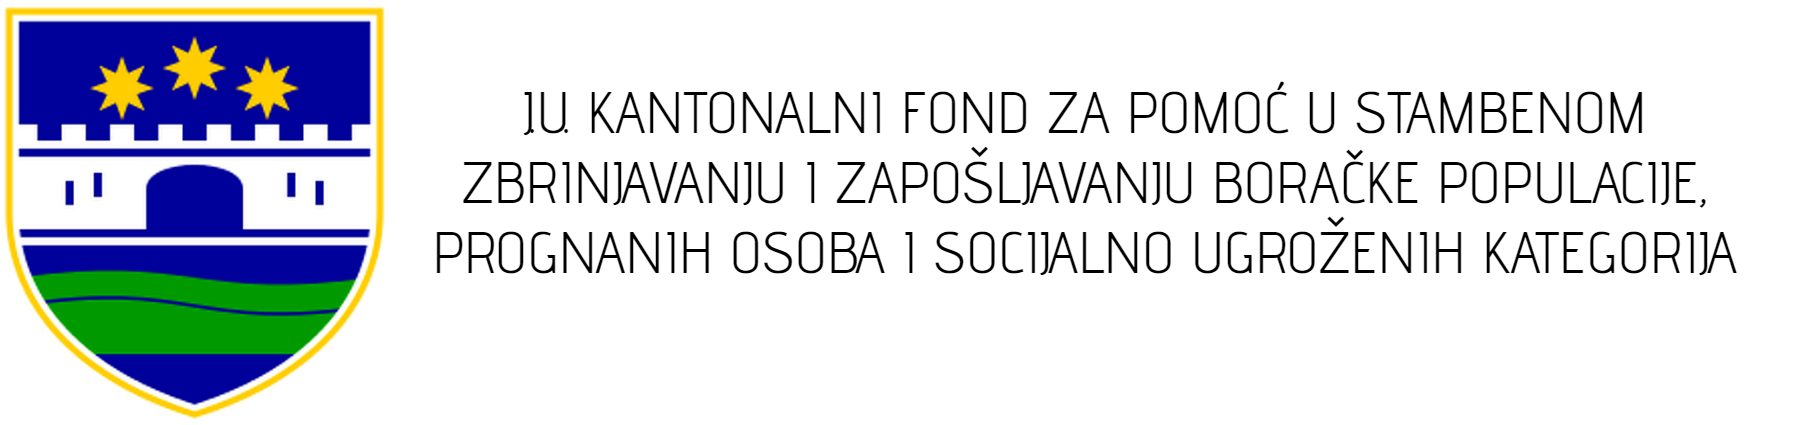 cropped-Kantonalni-fond-USK-logo-1.jpg